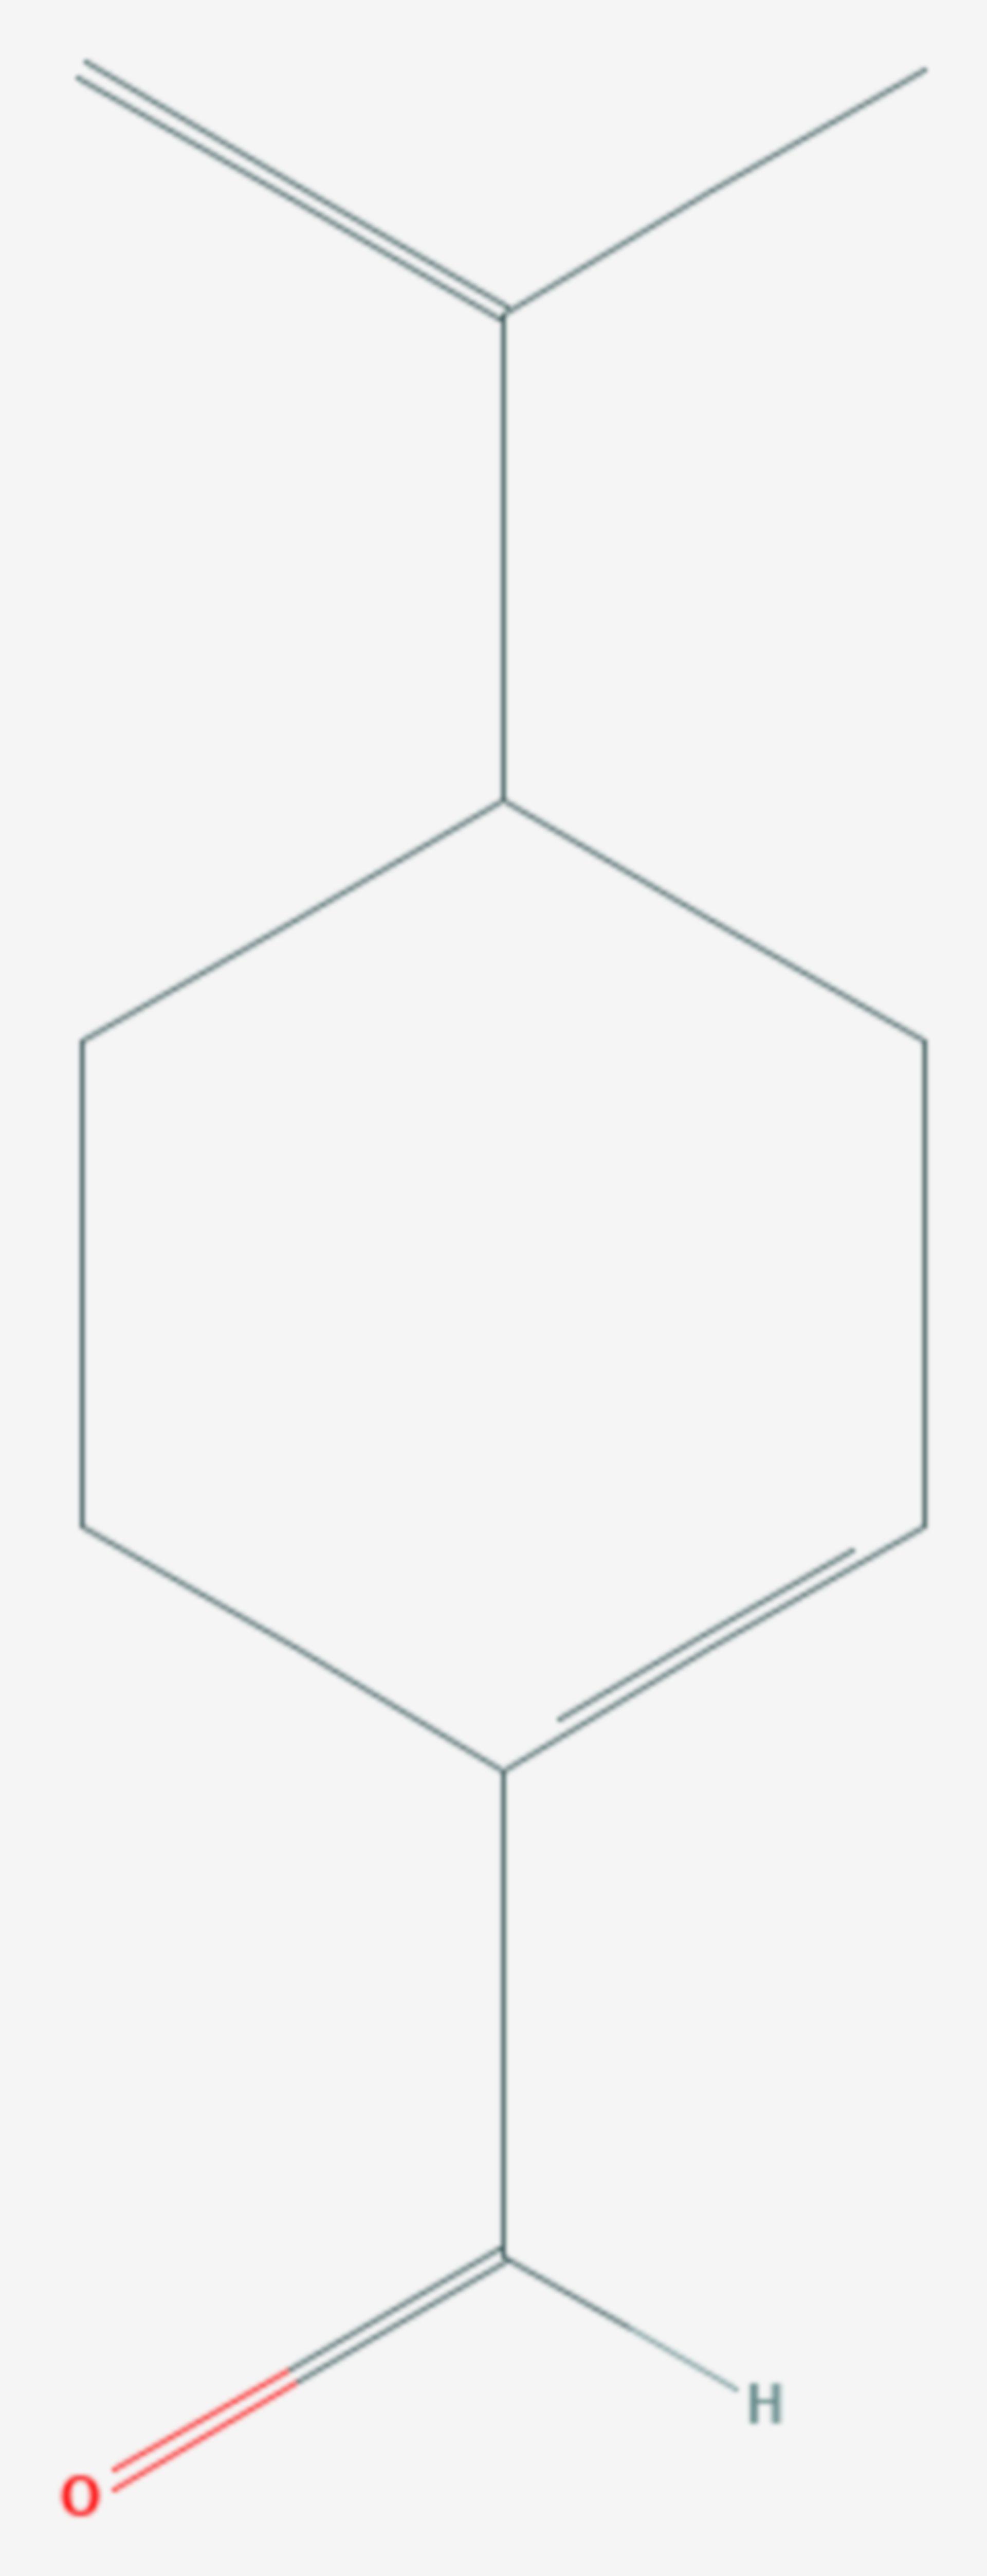 Perillaaldehyd (Strukturformel)